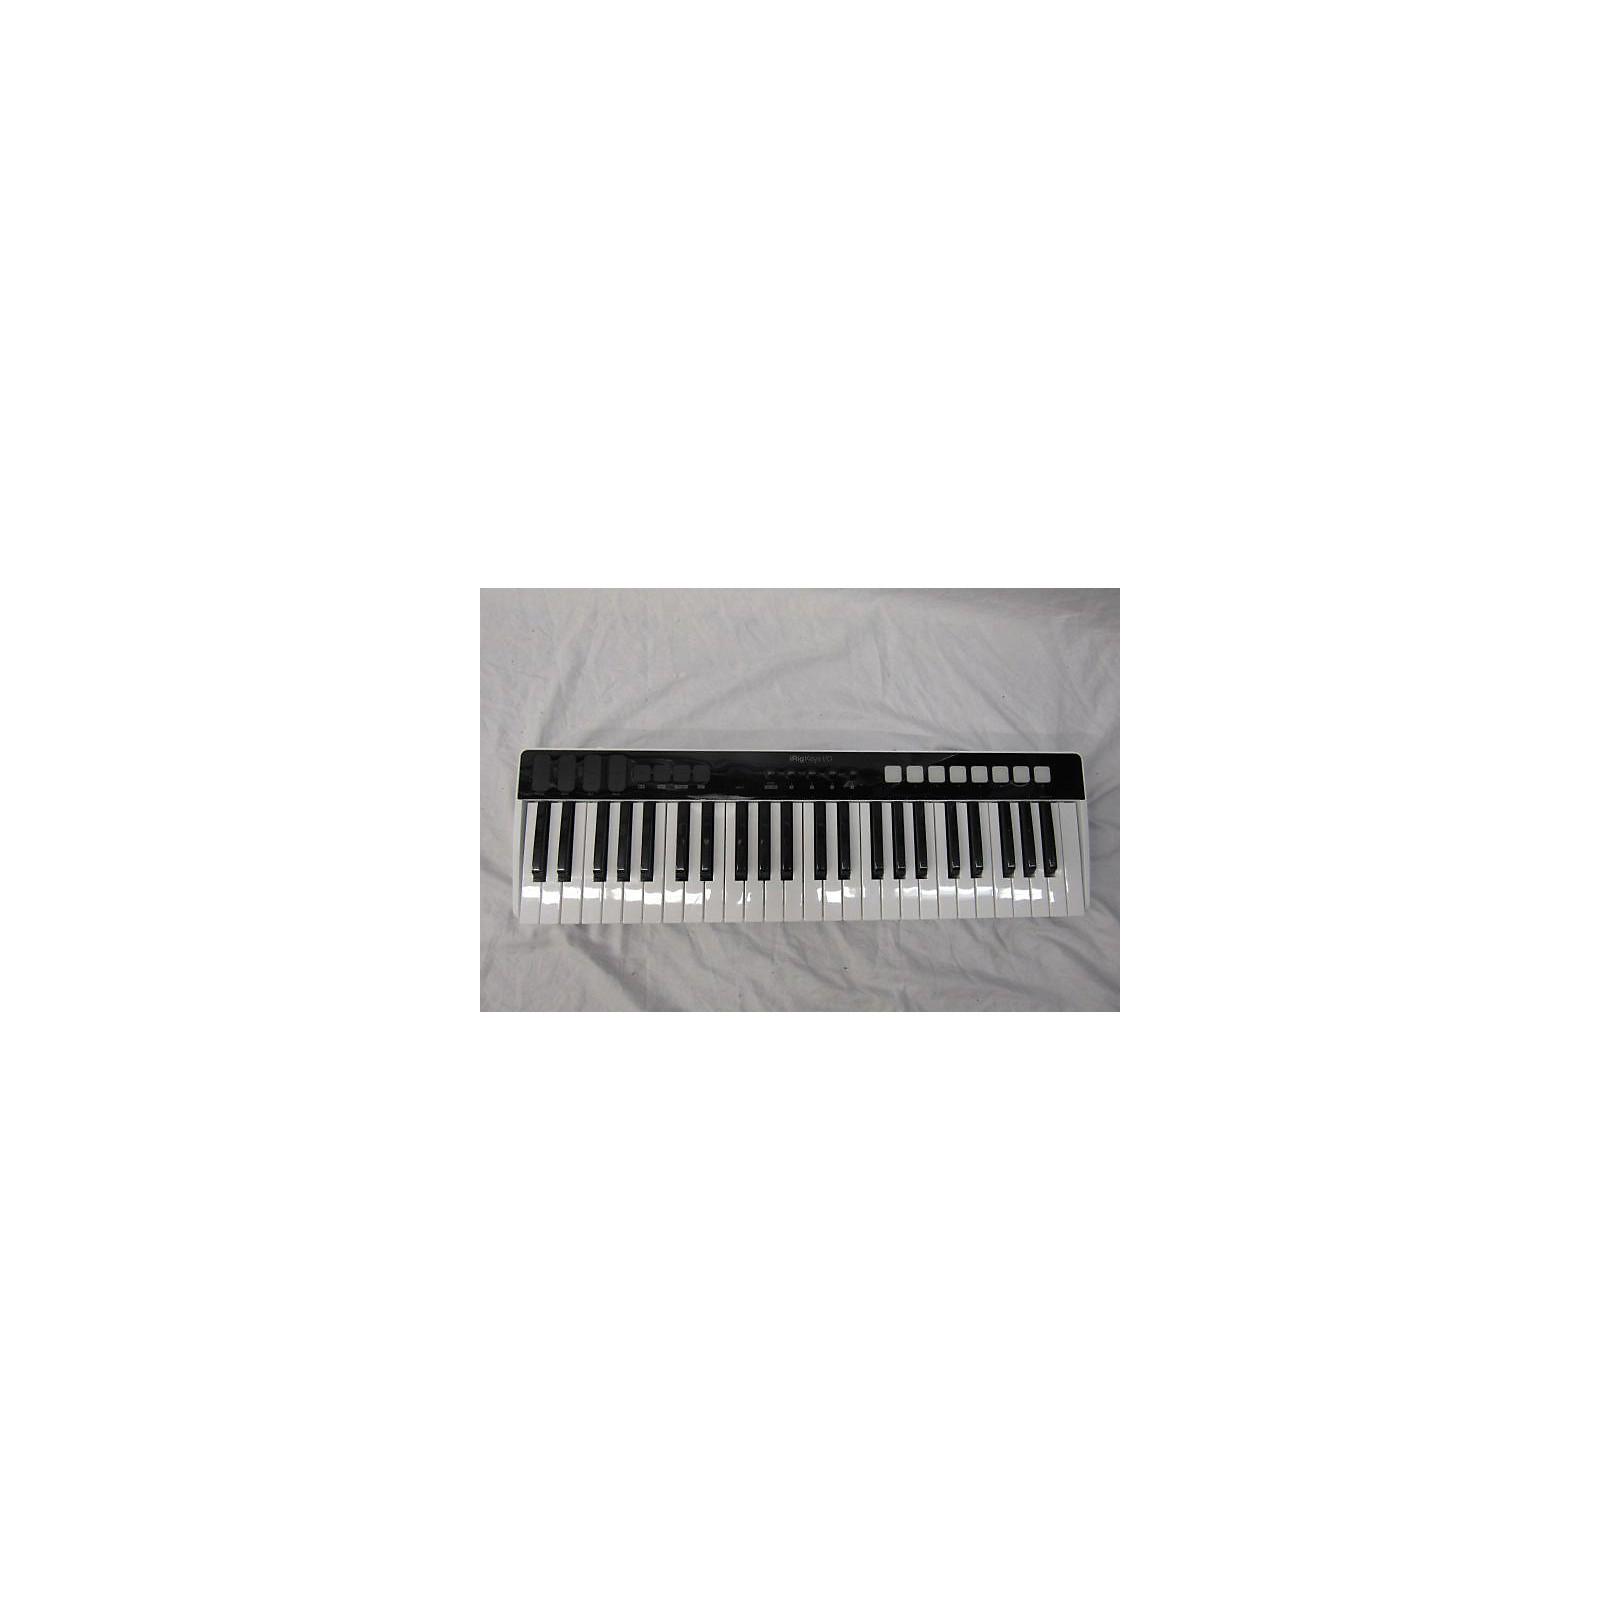 In Store Used Used Irig Keys I/O MIDI Controller